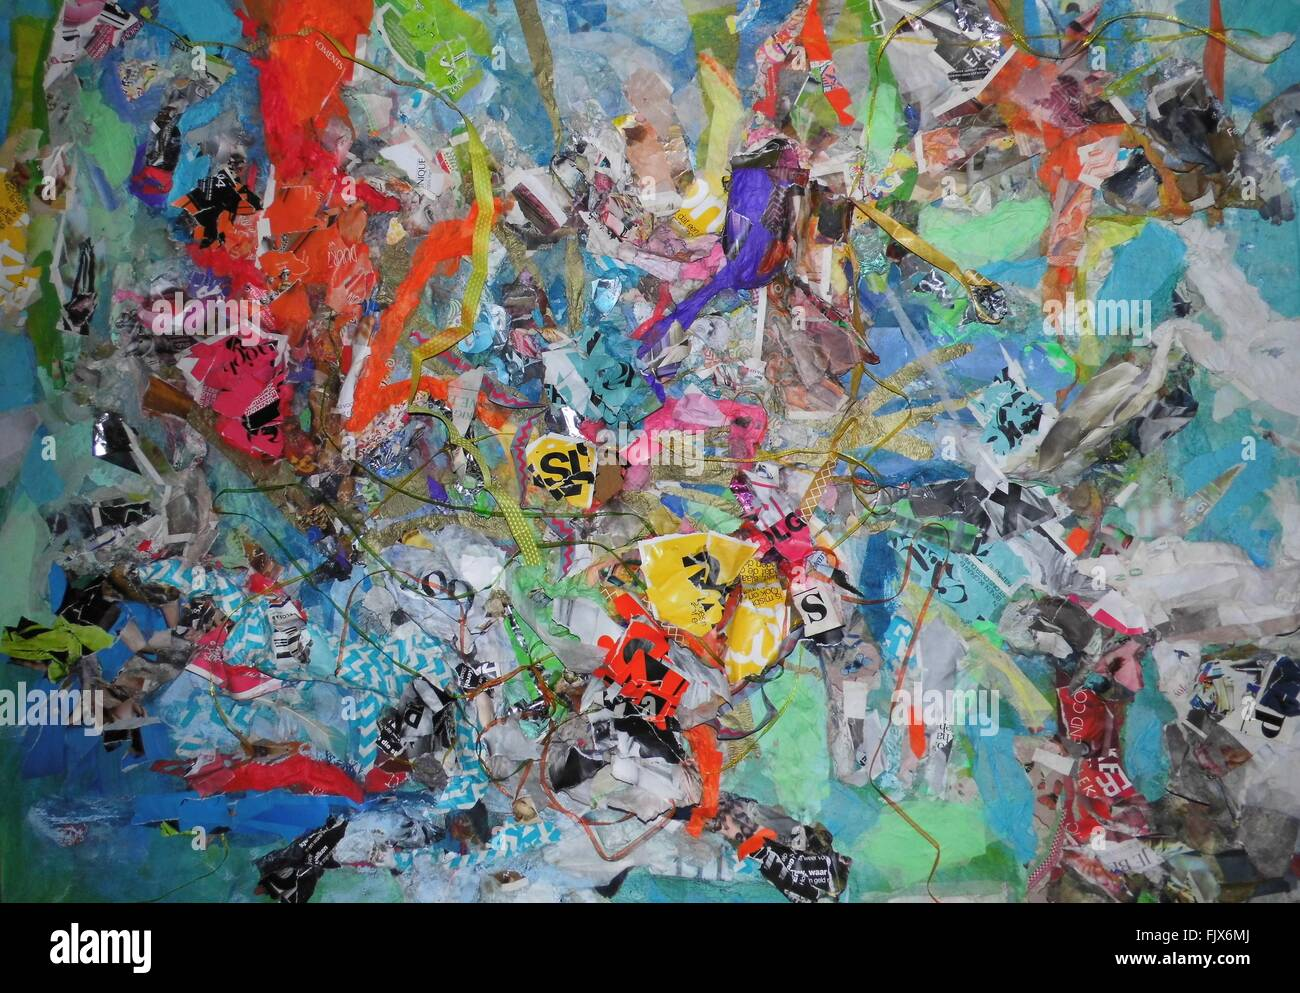 Full Frame Shot Of Multi Colored Paper Art On Wall - Stock Image